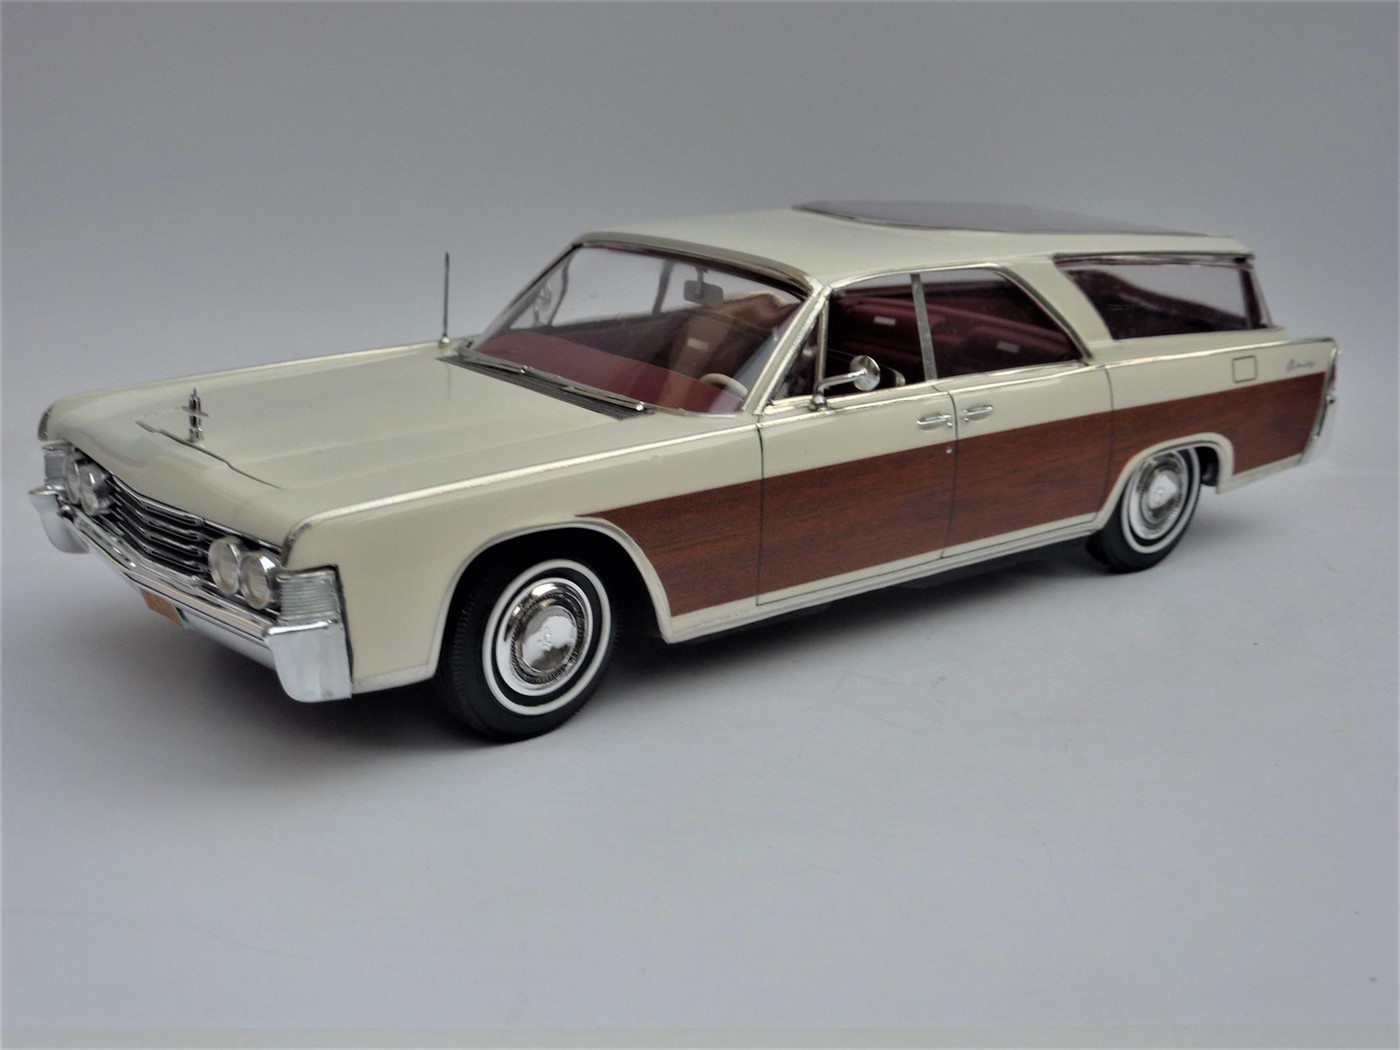 Lincoln wagon 65 terminée Photo90-vi